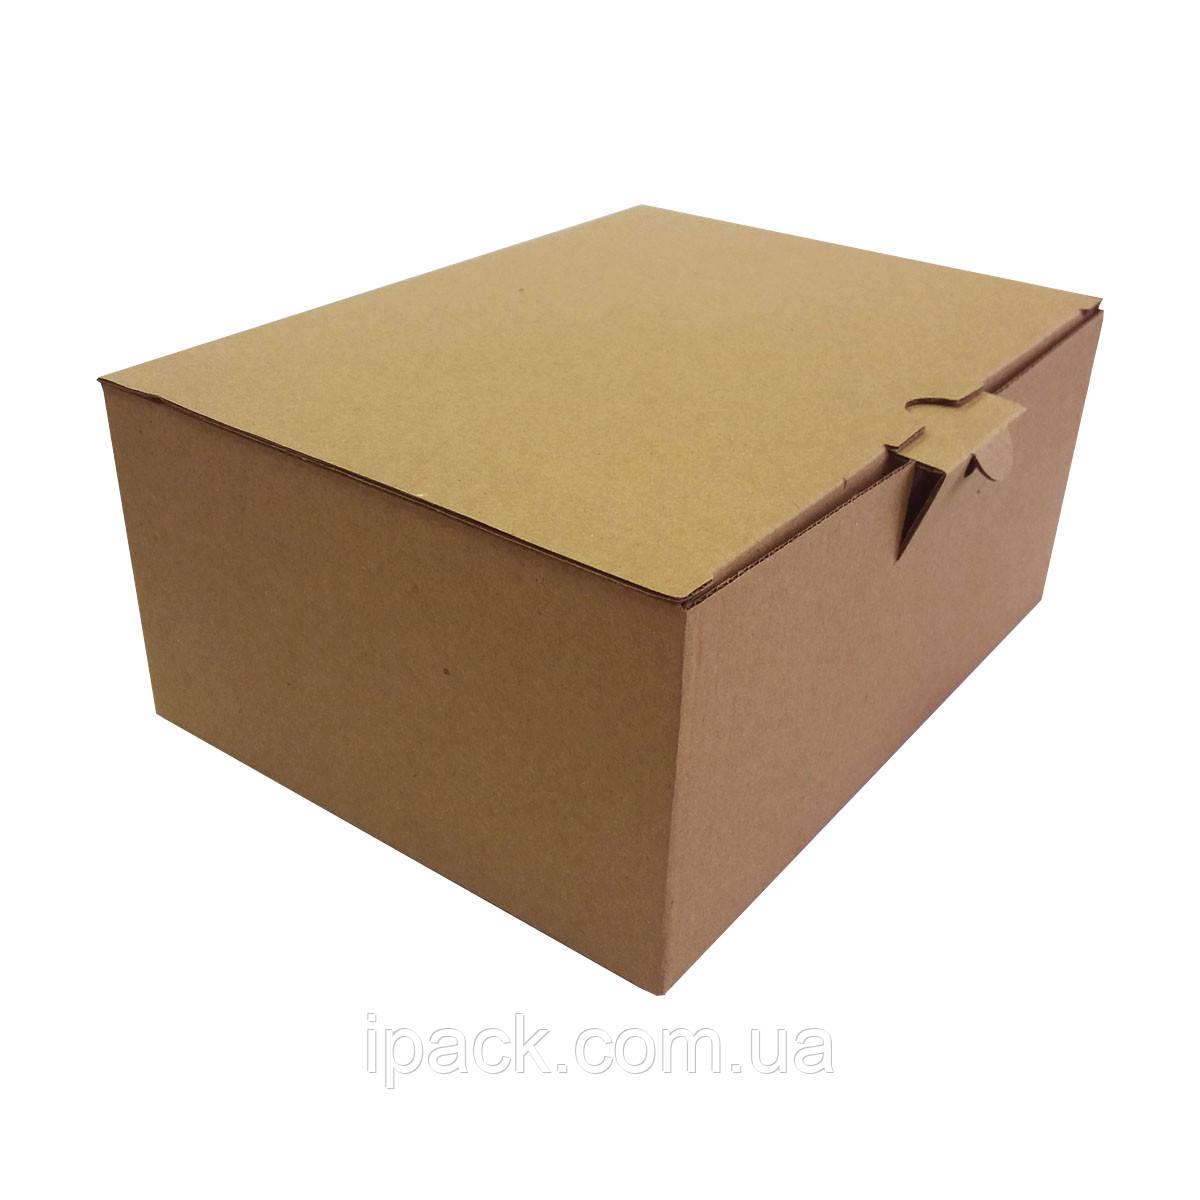 Коробка картонная самосборная, 185*143*100, мм, бурая, крафт, микрогофрокартон